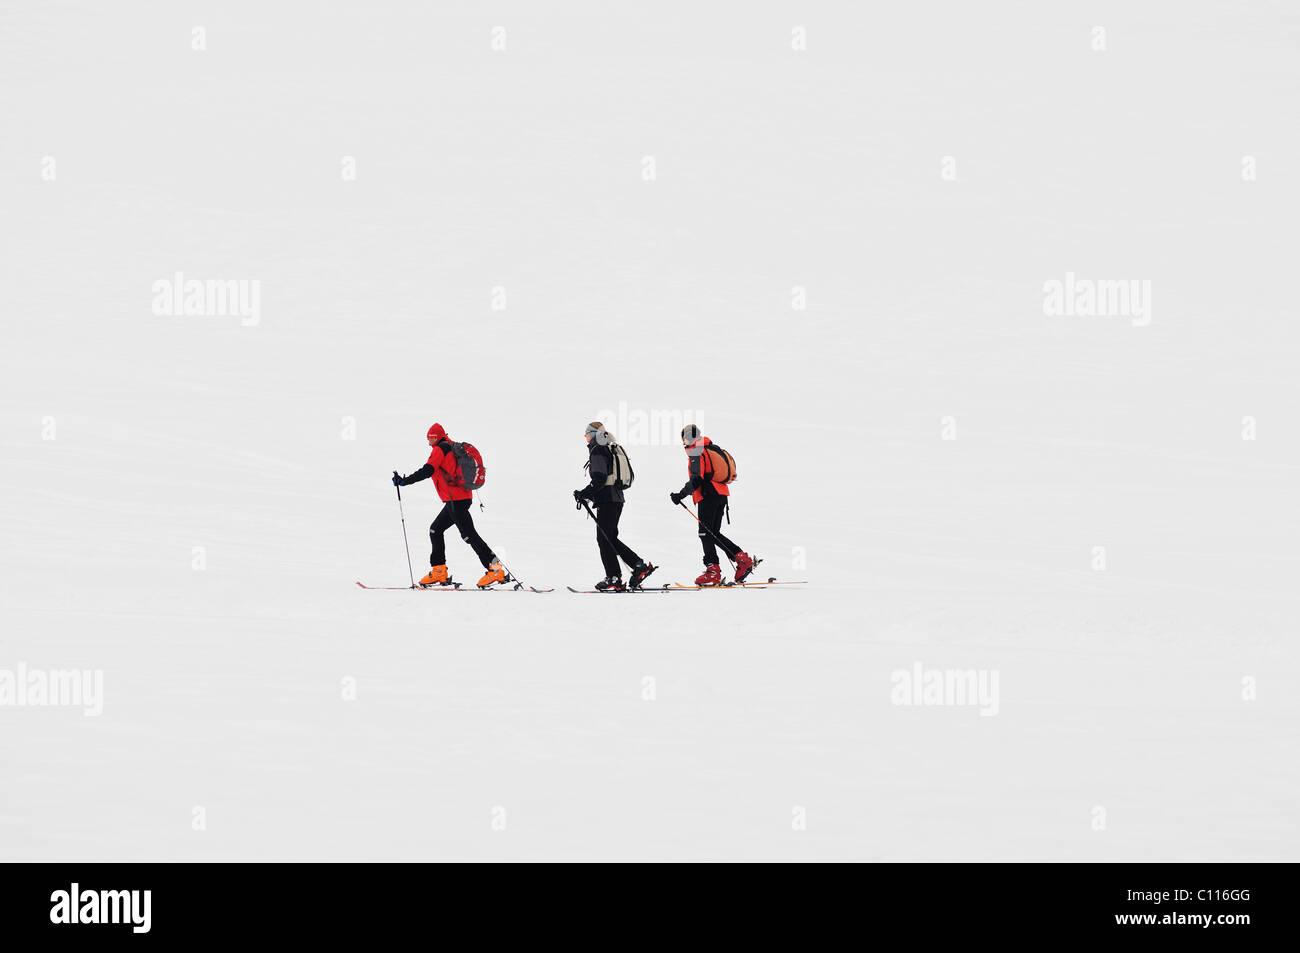 Trois randonneurs à ski Photo Stock